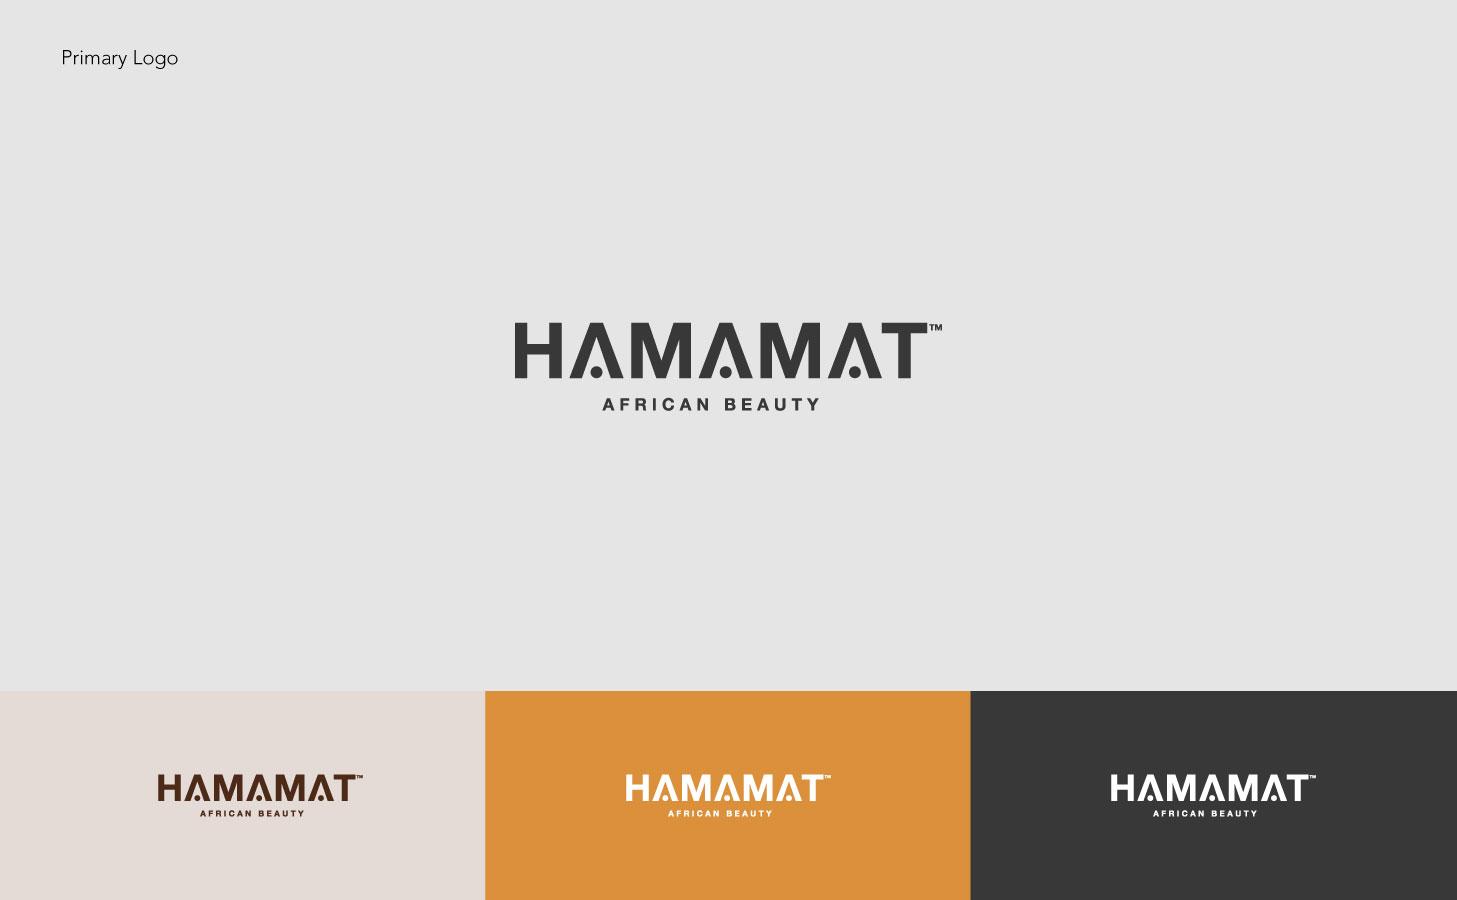 Hamamat Brand Identity Designs